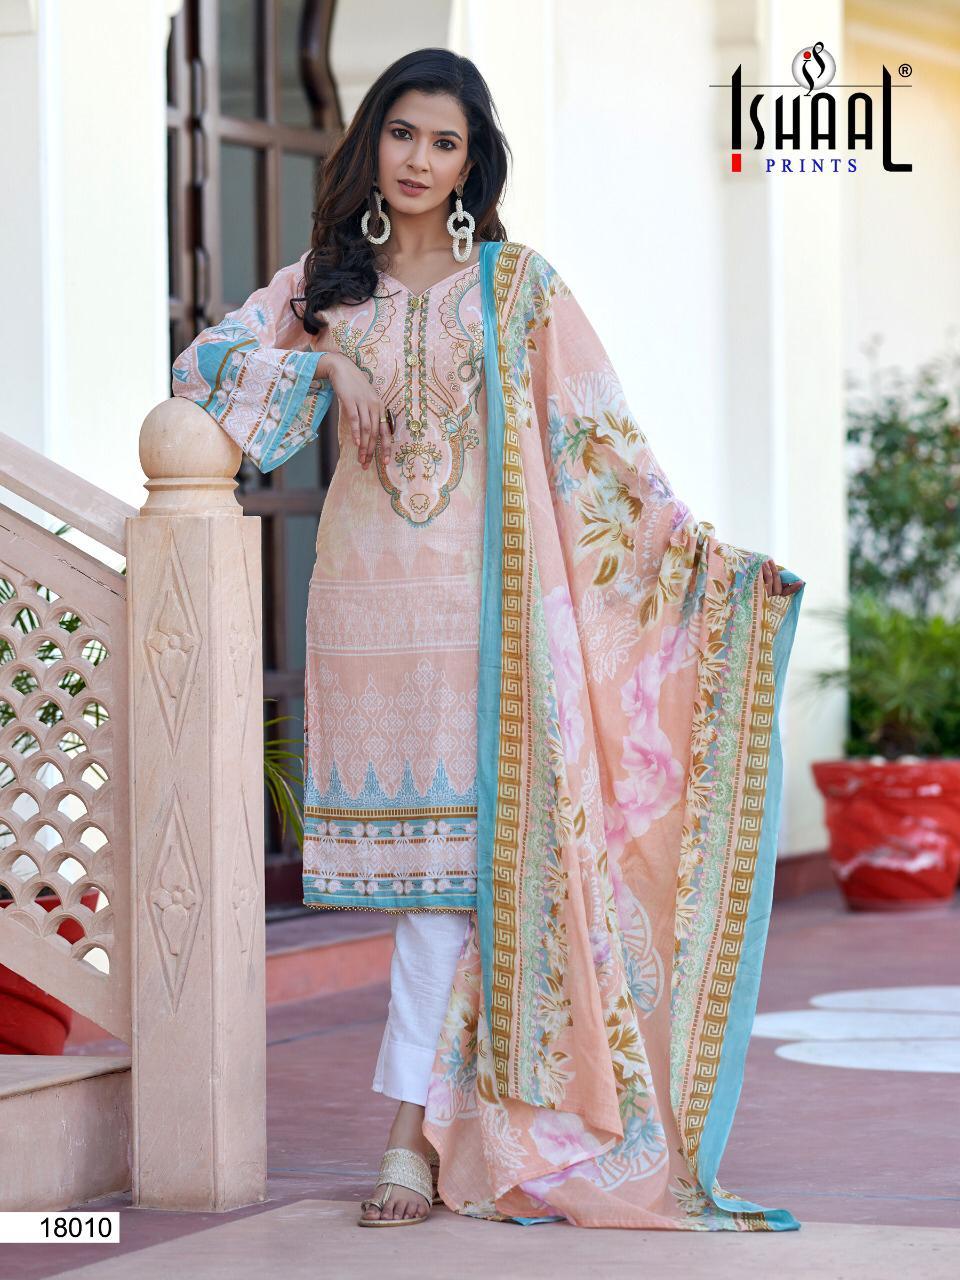 Ishaal Gulmohar Vol 18 Salwar Suit Wholesale Catalog 10 Pcs 3 - Ishaal Gulmohar Vol 18 Salwar Suit Wholesale Catalog 10 Pcs